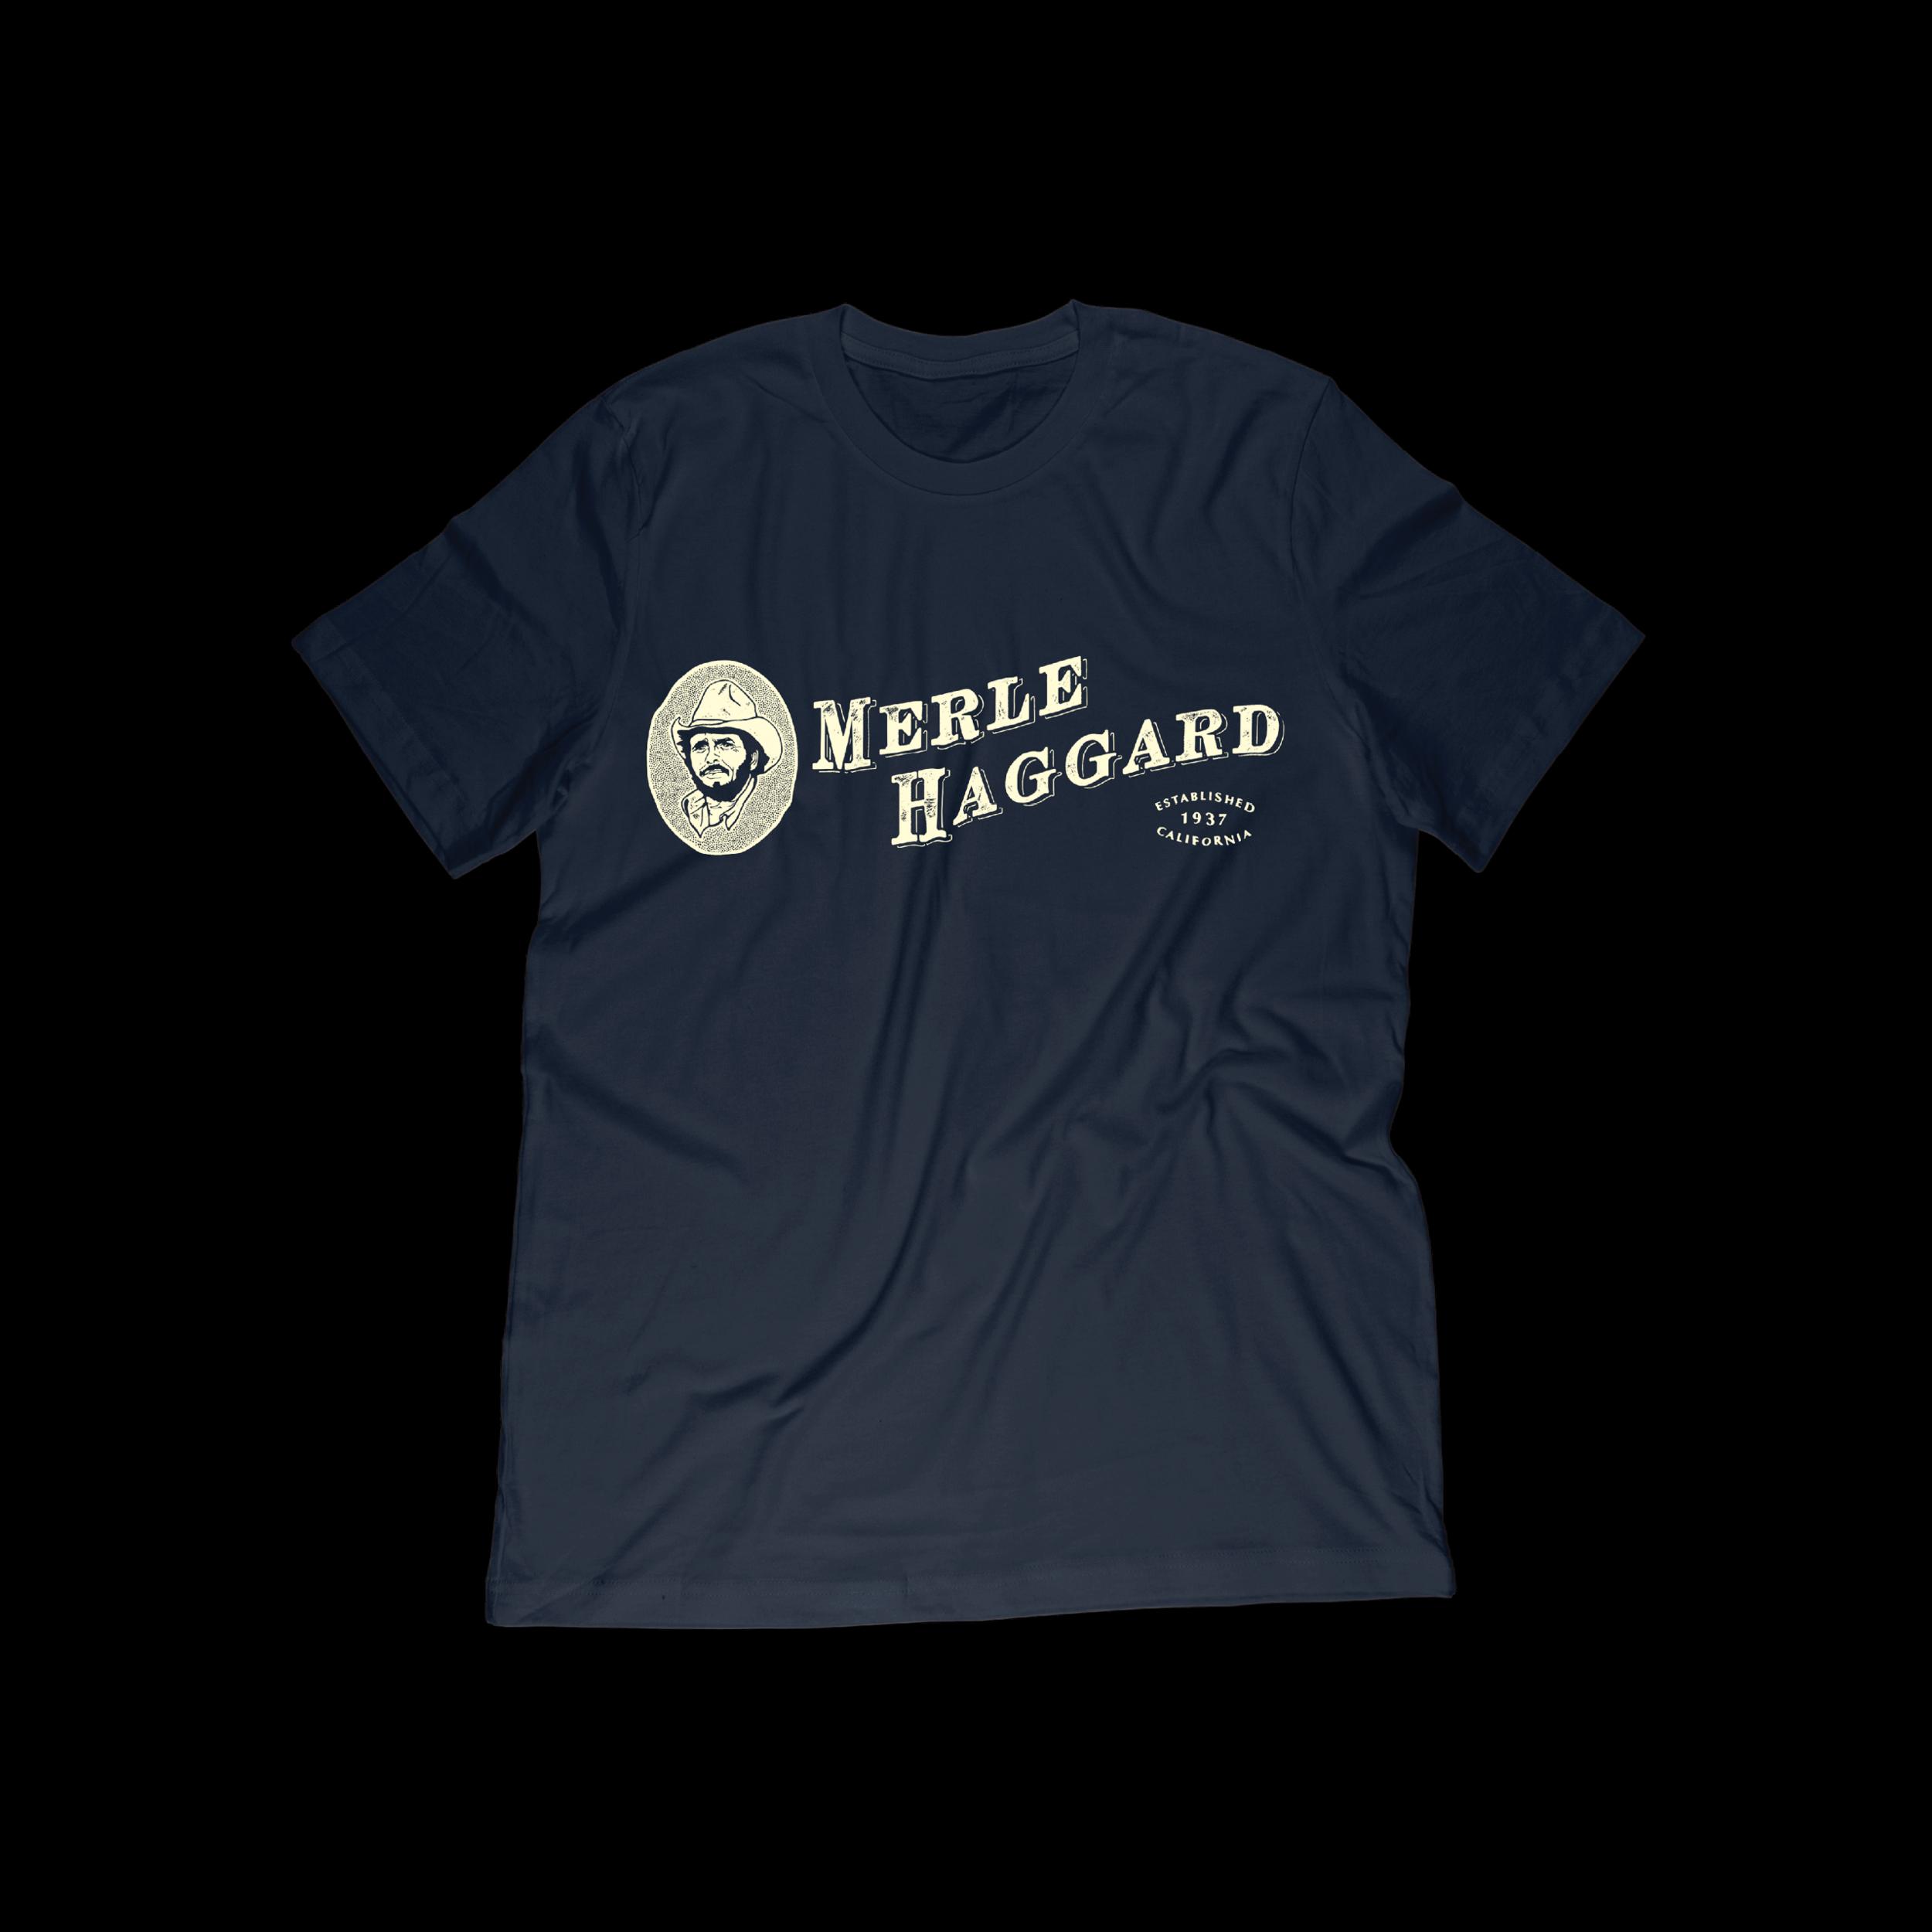 MerleHaggard-MockUps-0527194.png